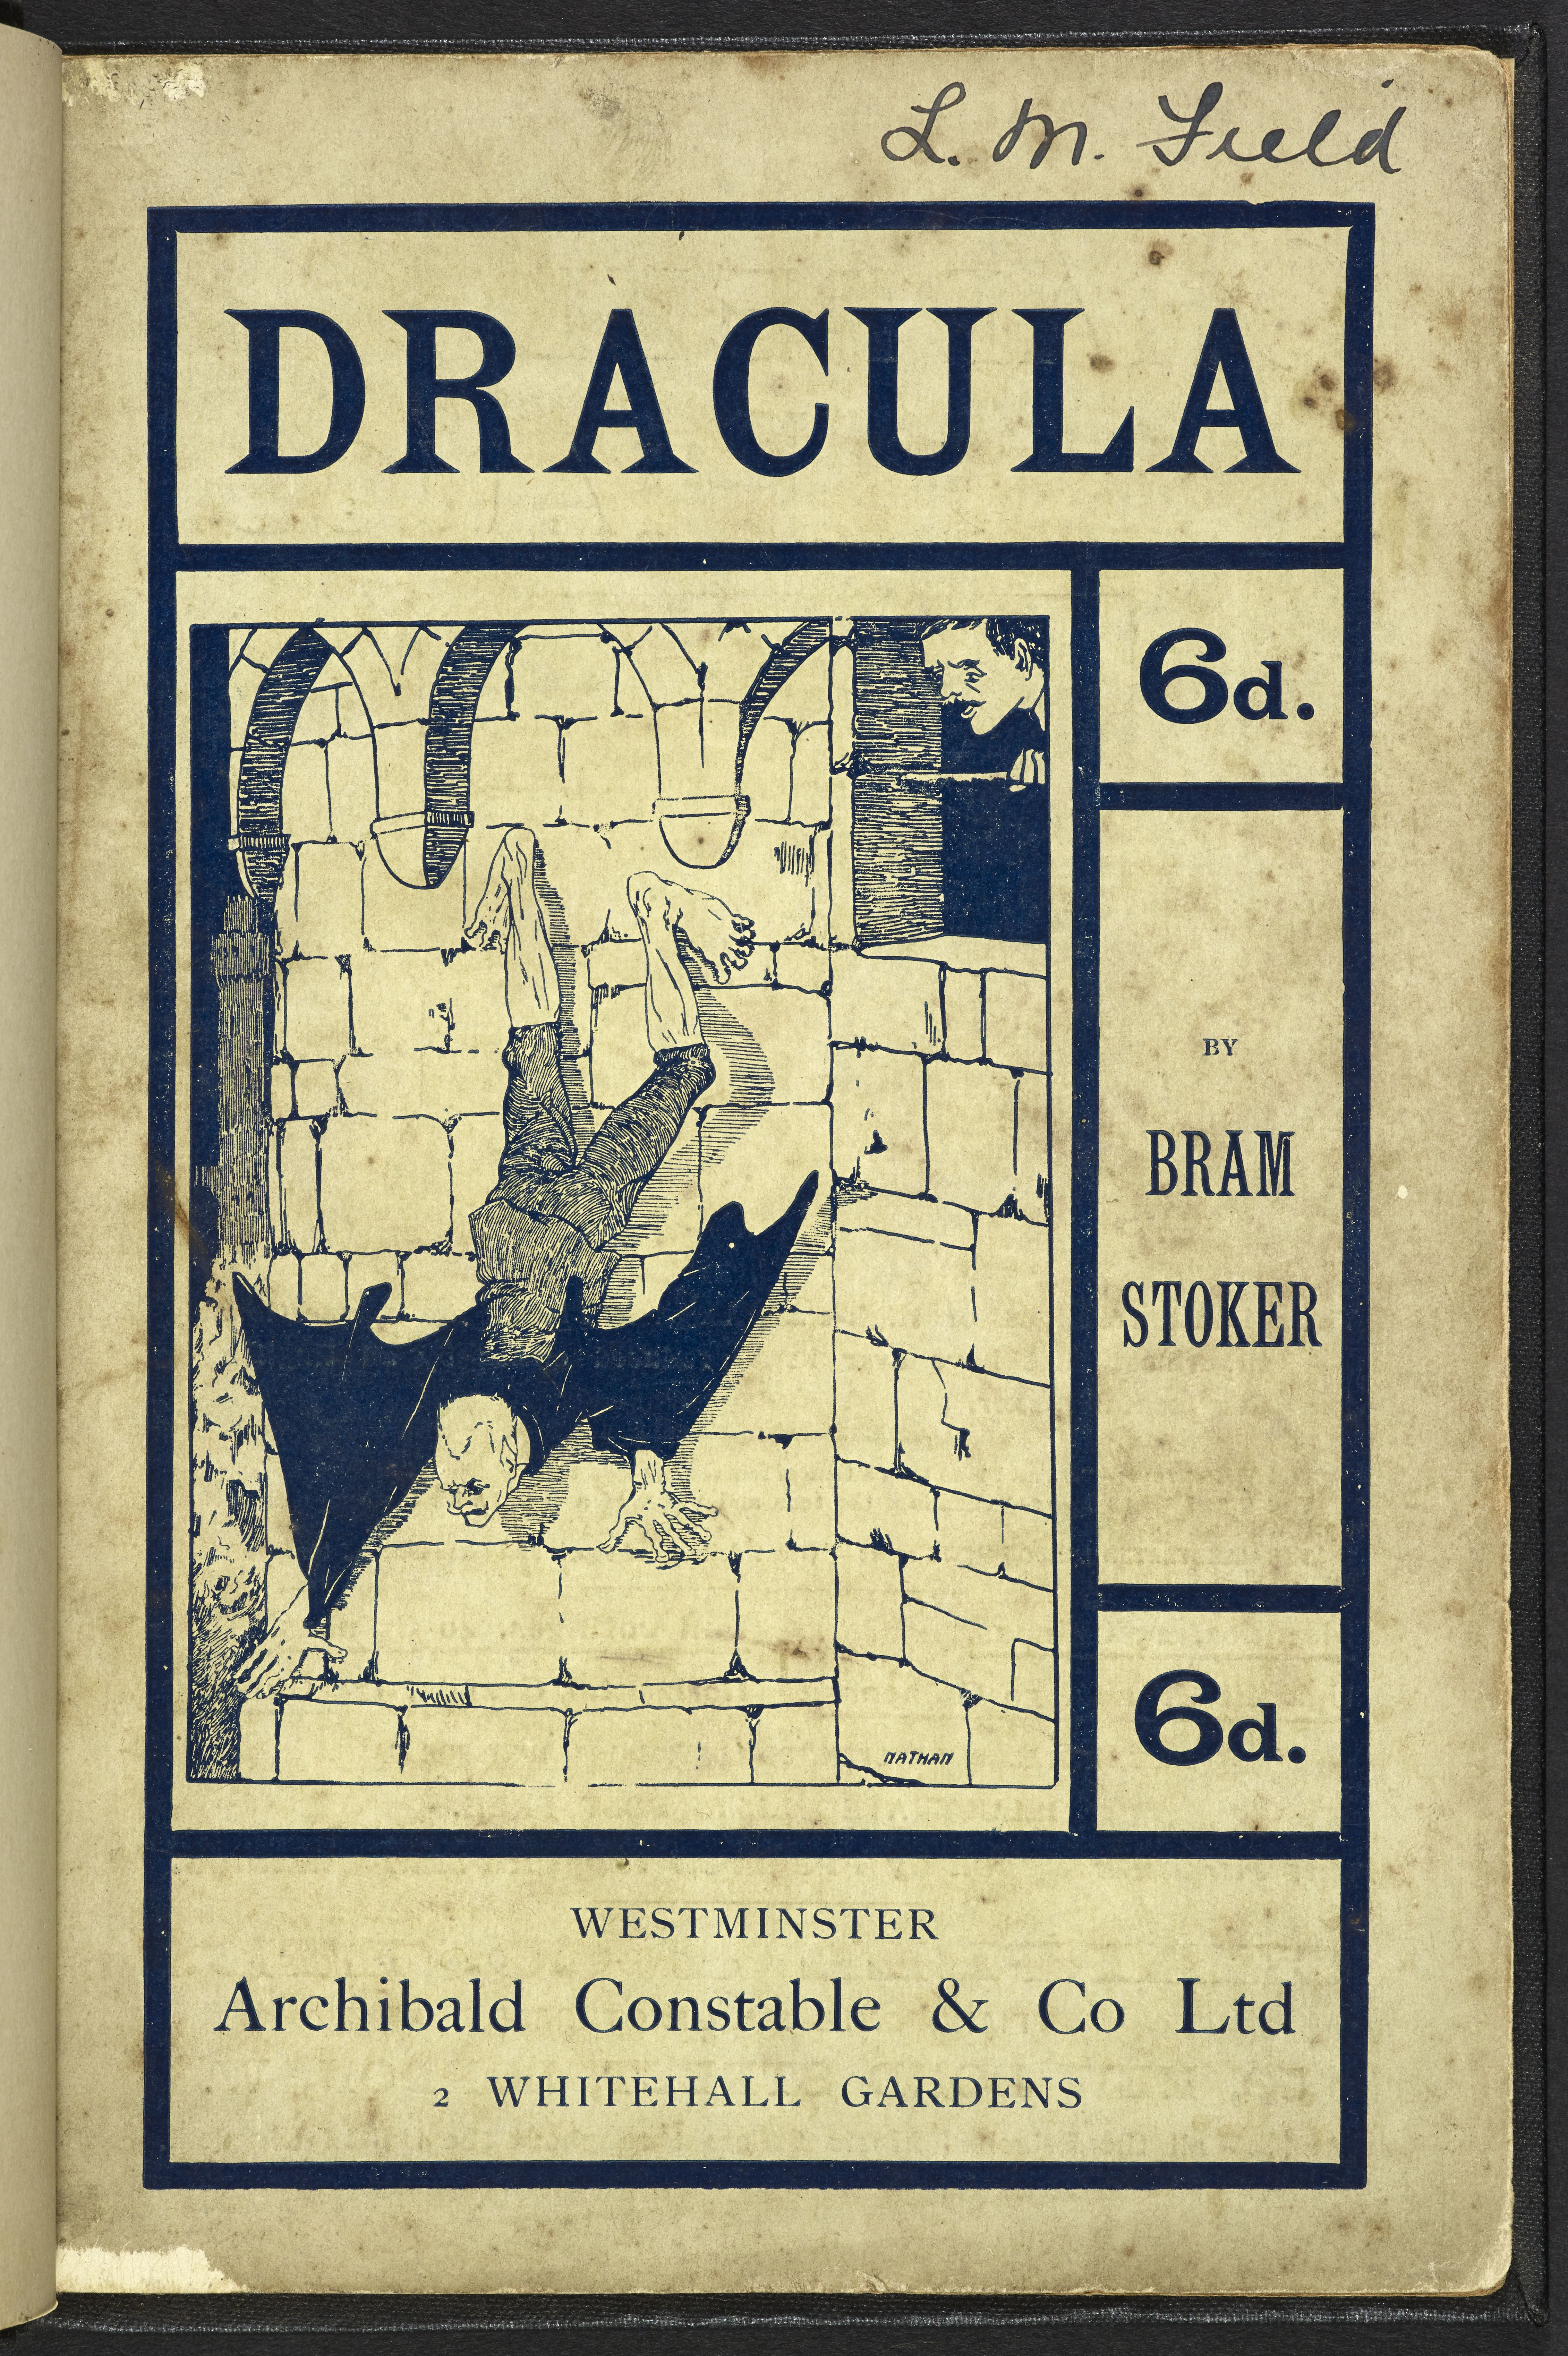 Dracula first image, bram stoker